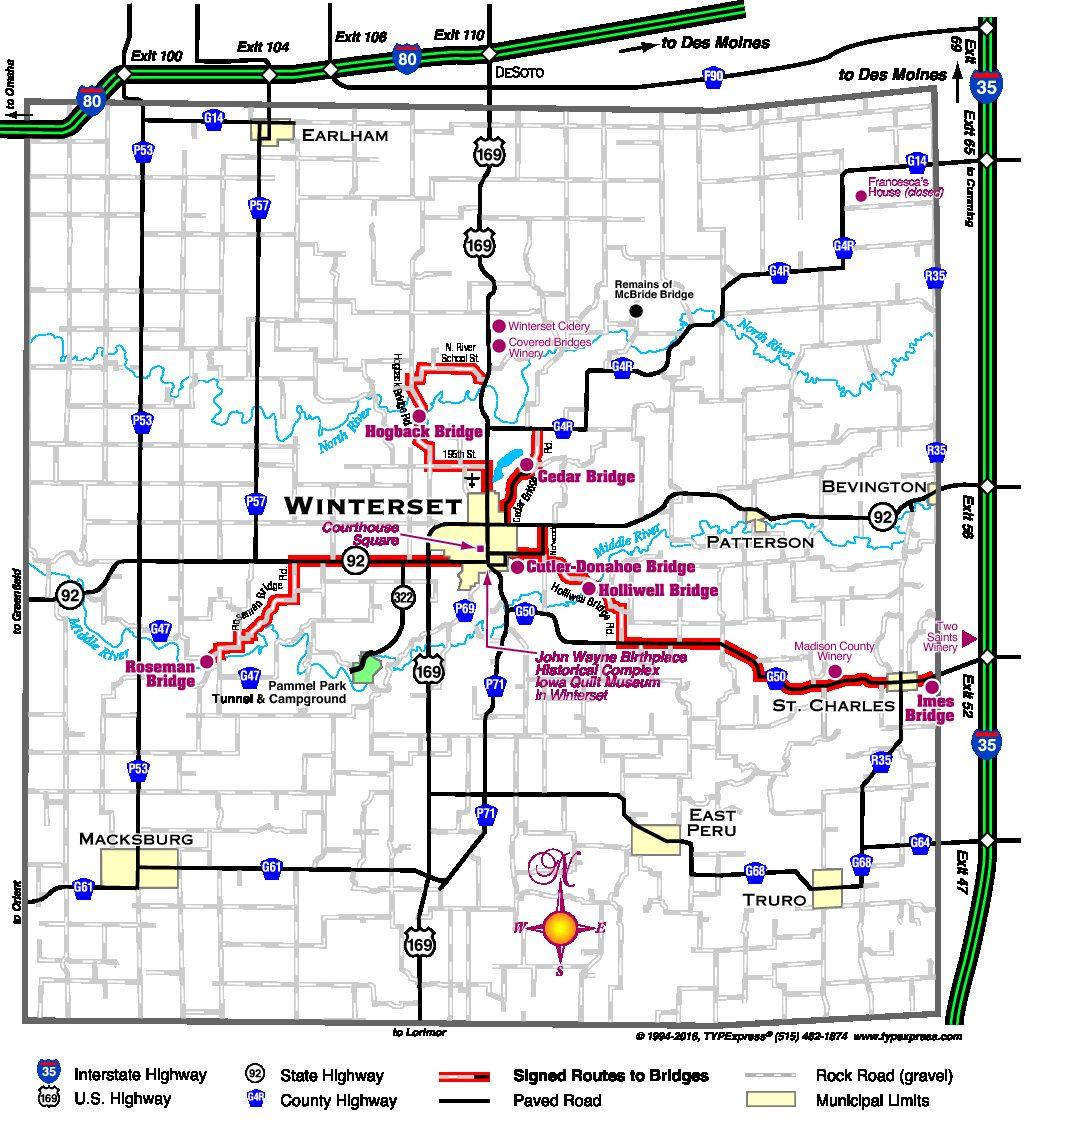 map of madison county iowa Madison County Map 2016 10 24 Madison County Iowa Chamber map of madison county iowa